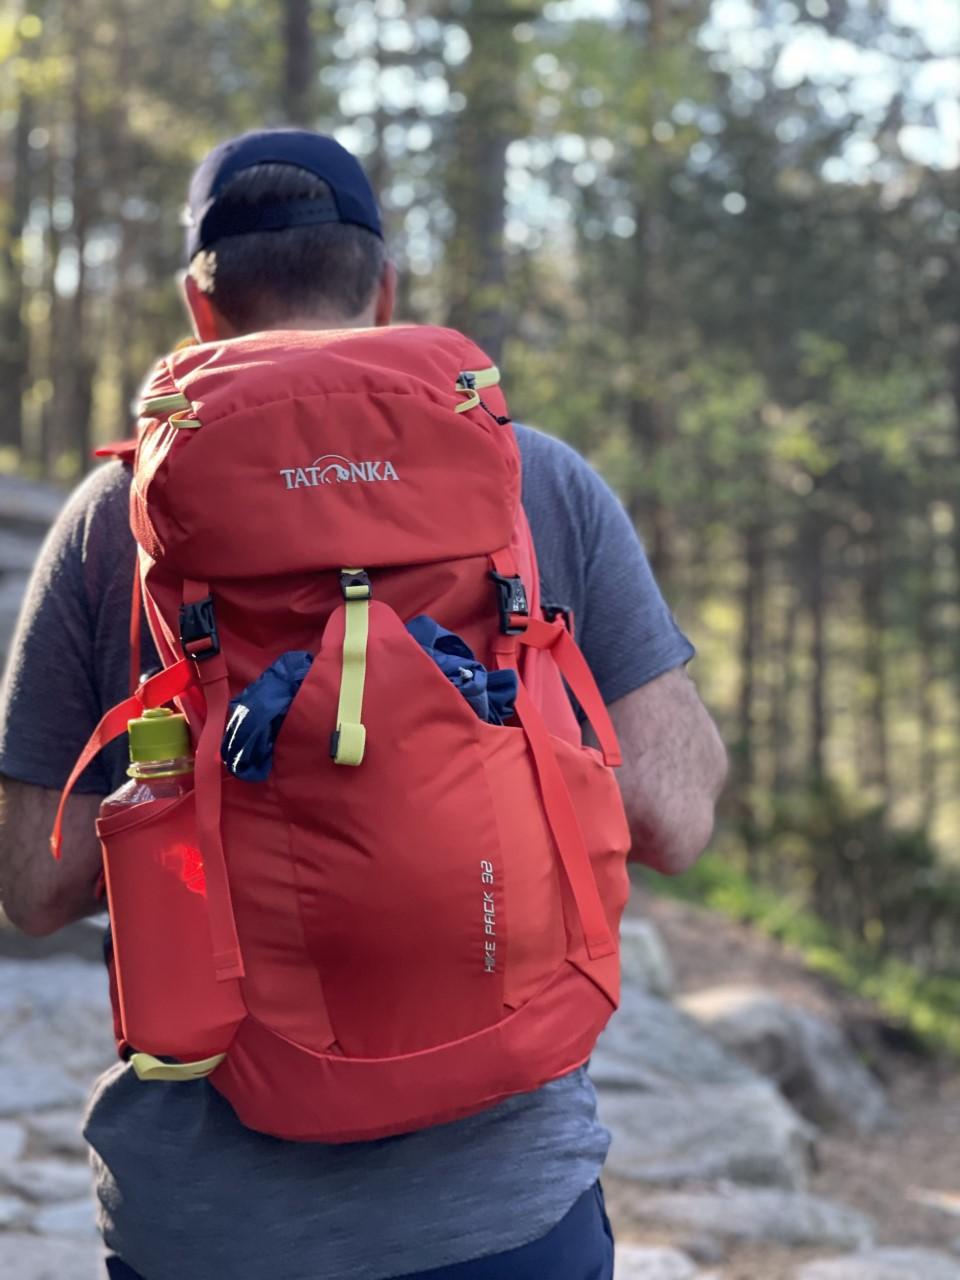 Tatonka Hike pack 32L(5)